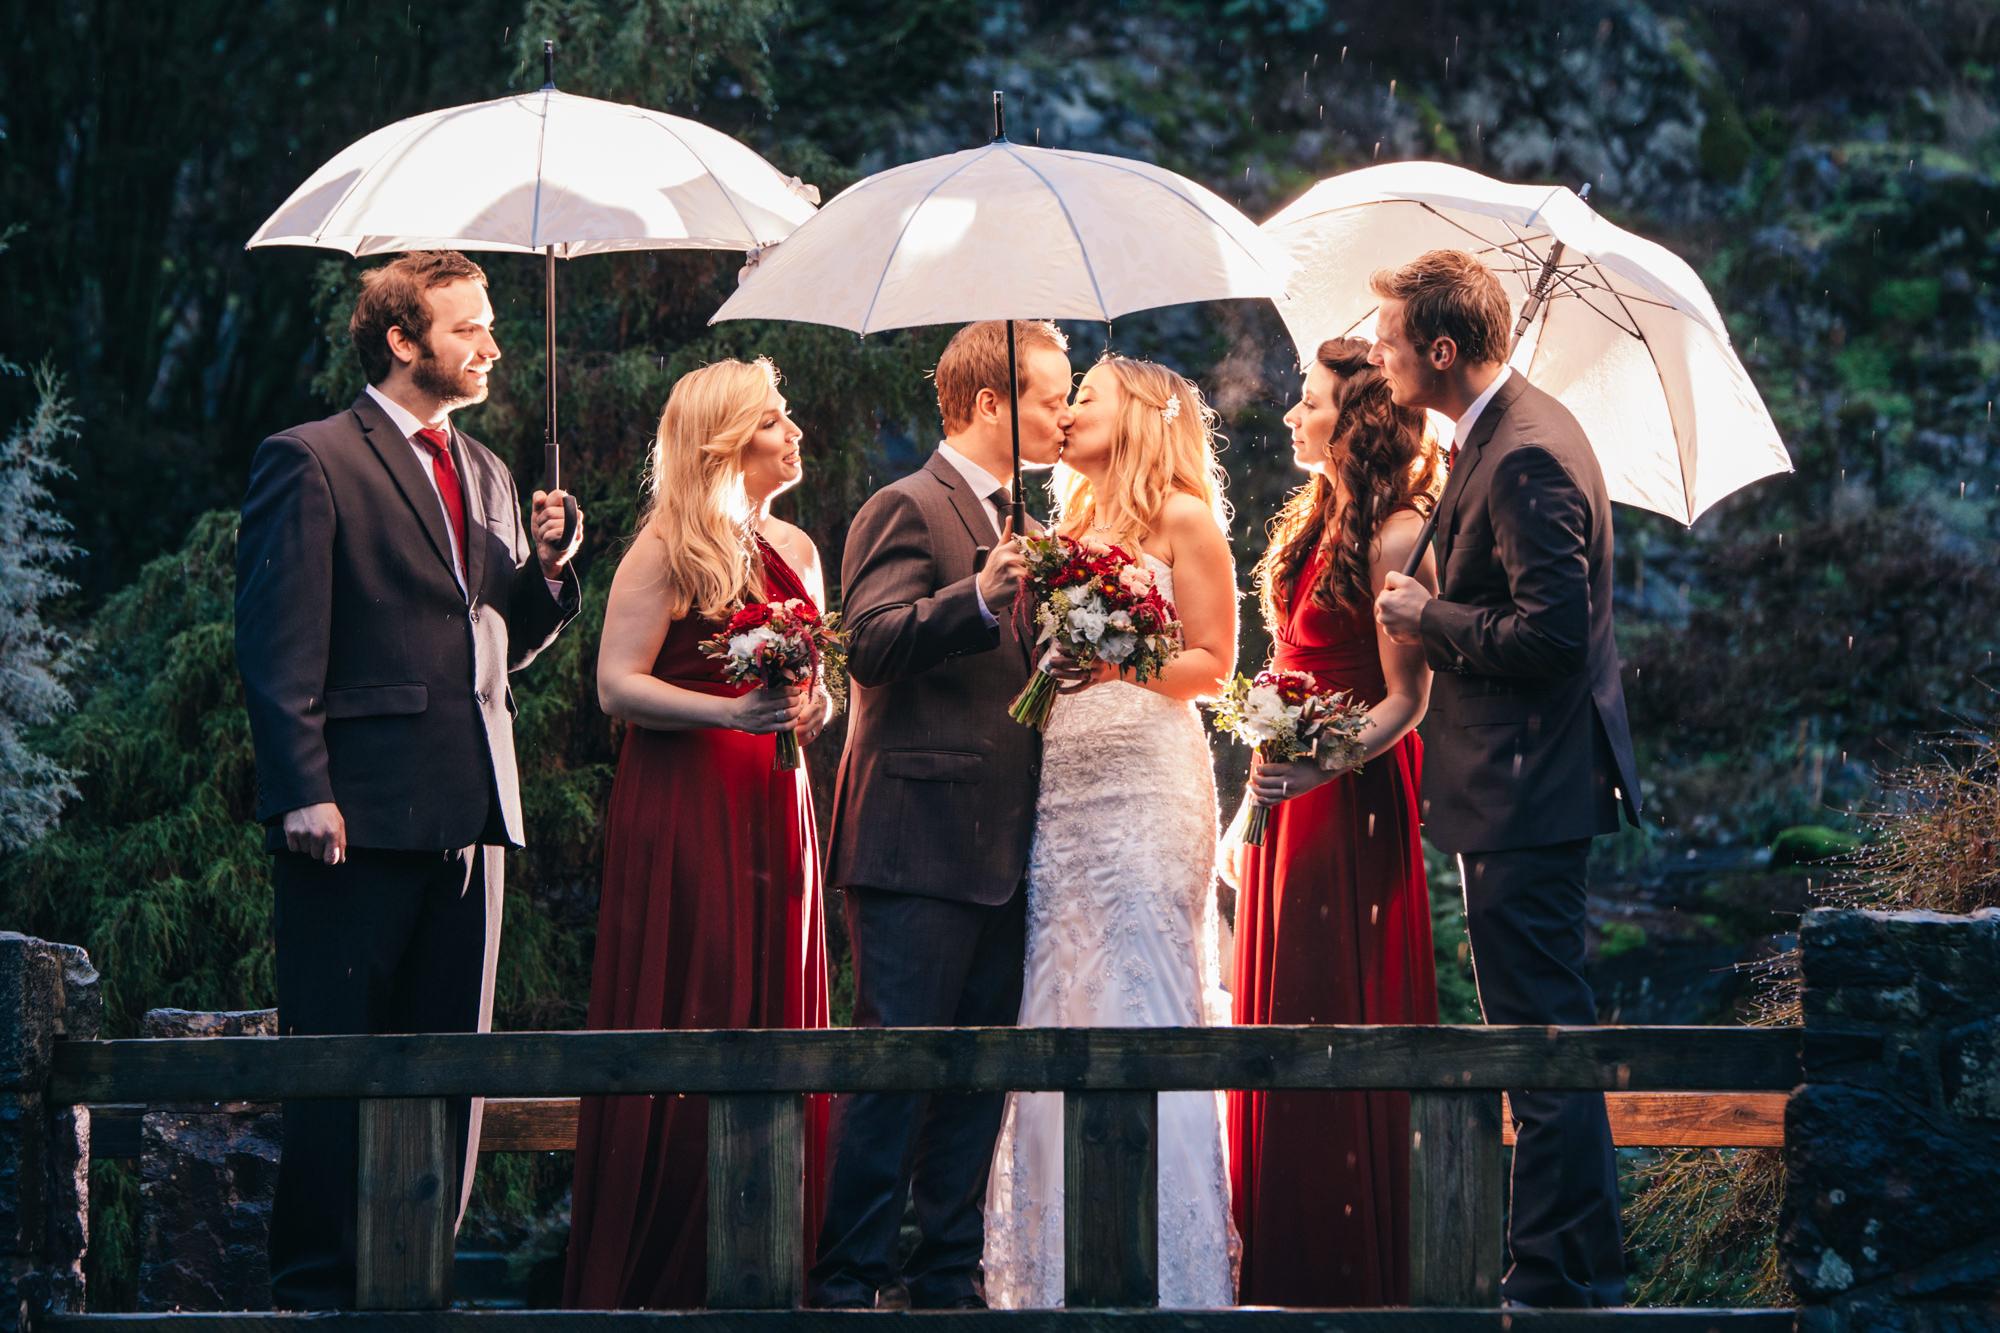 18-queen-elizabeth-park-wedding-photo-umbrella.jpg